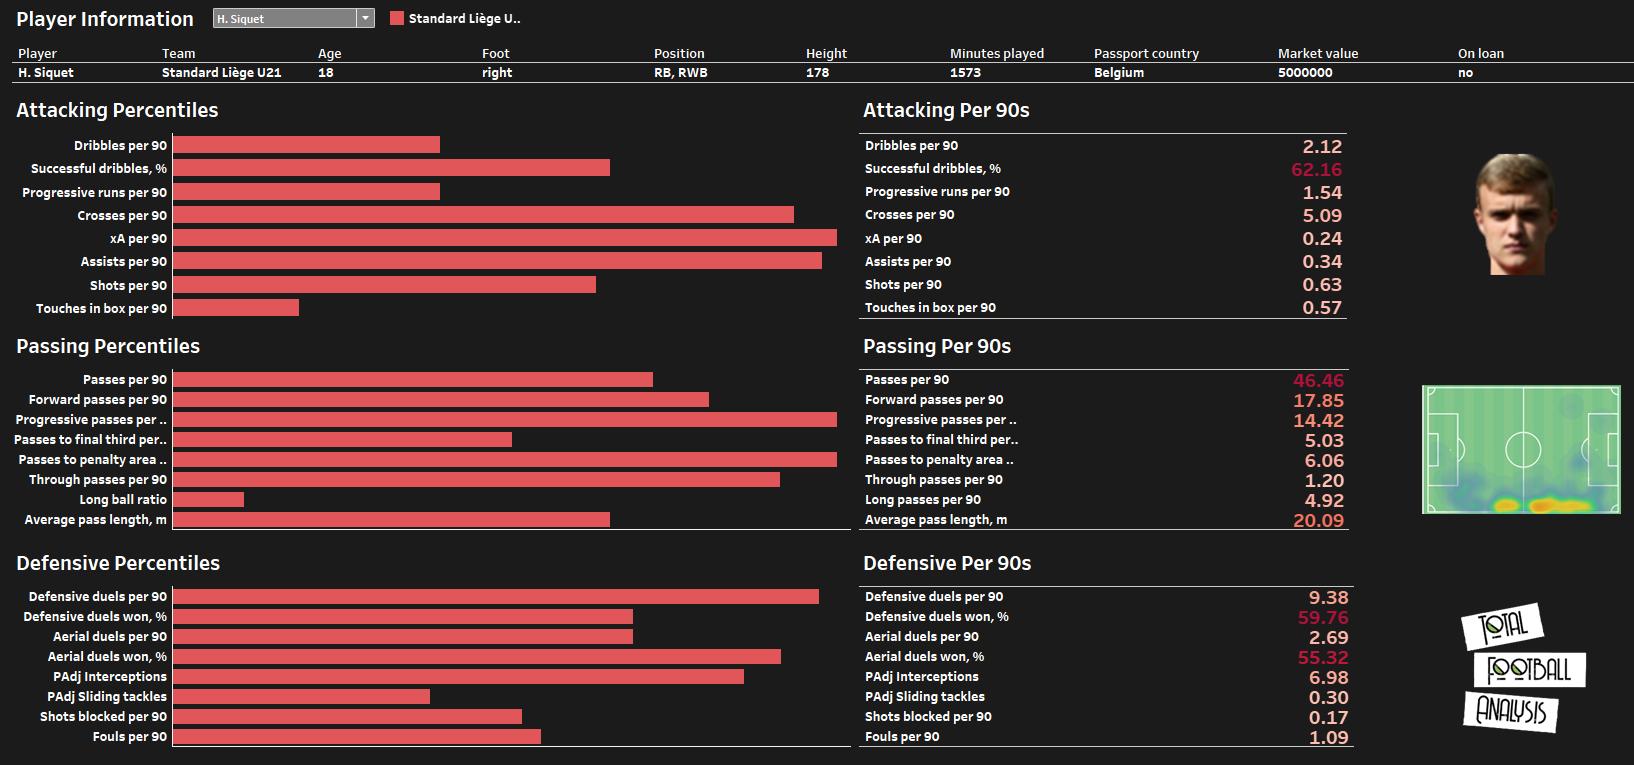 data-players-similar-trent-alexander-arnold